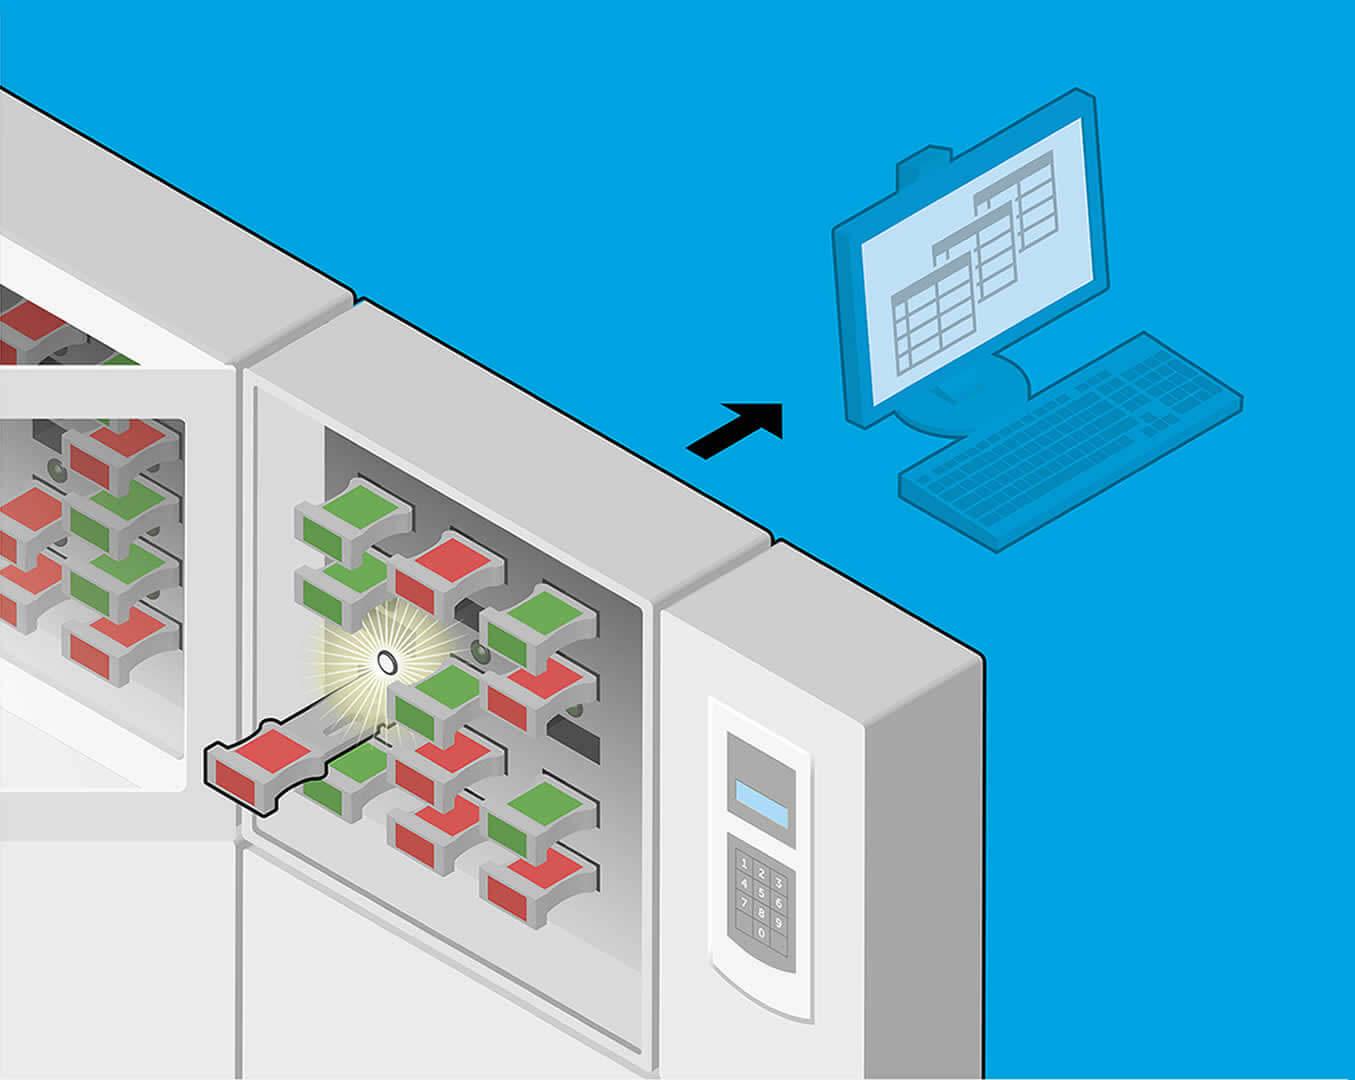 Information collect system for valve interlock keys